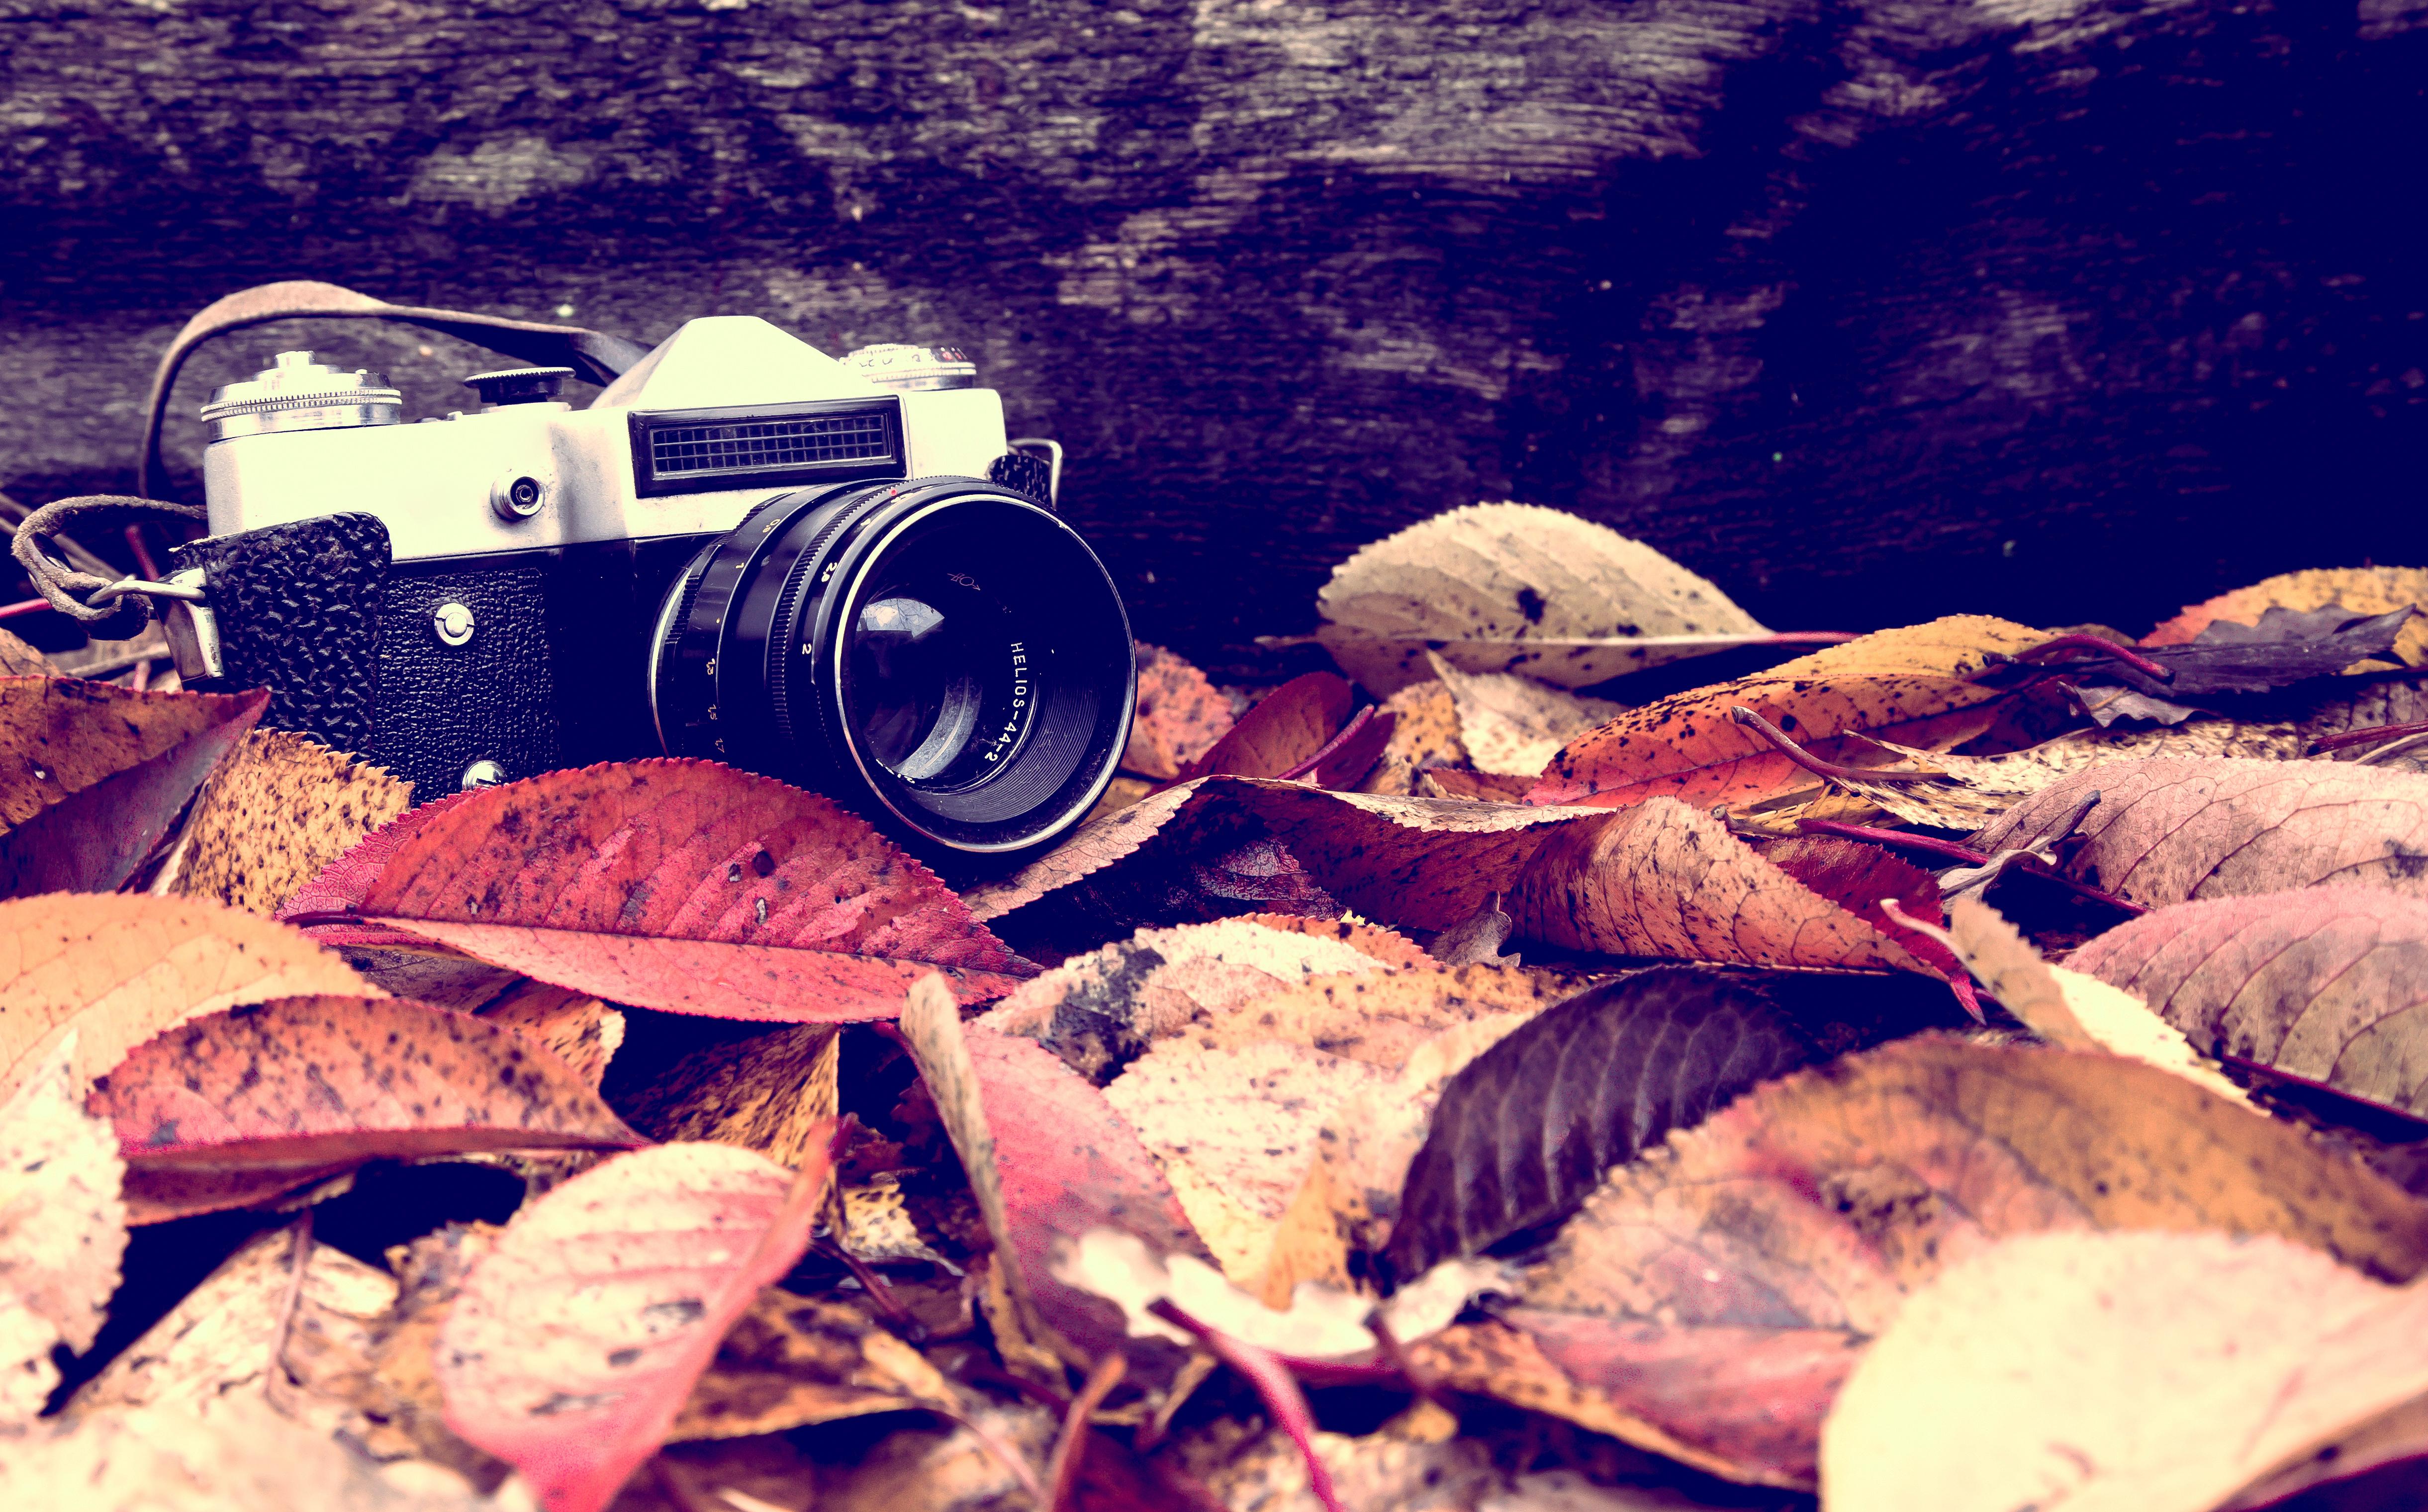 c55e3379 Bildet : kamera, blader, høst, arkivfotografi 4882x3041 - Vikysha ...